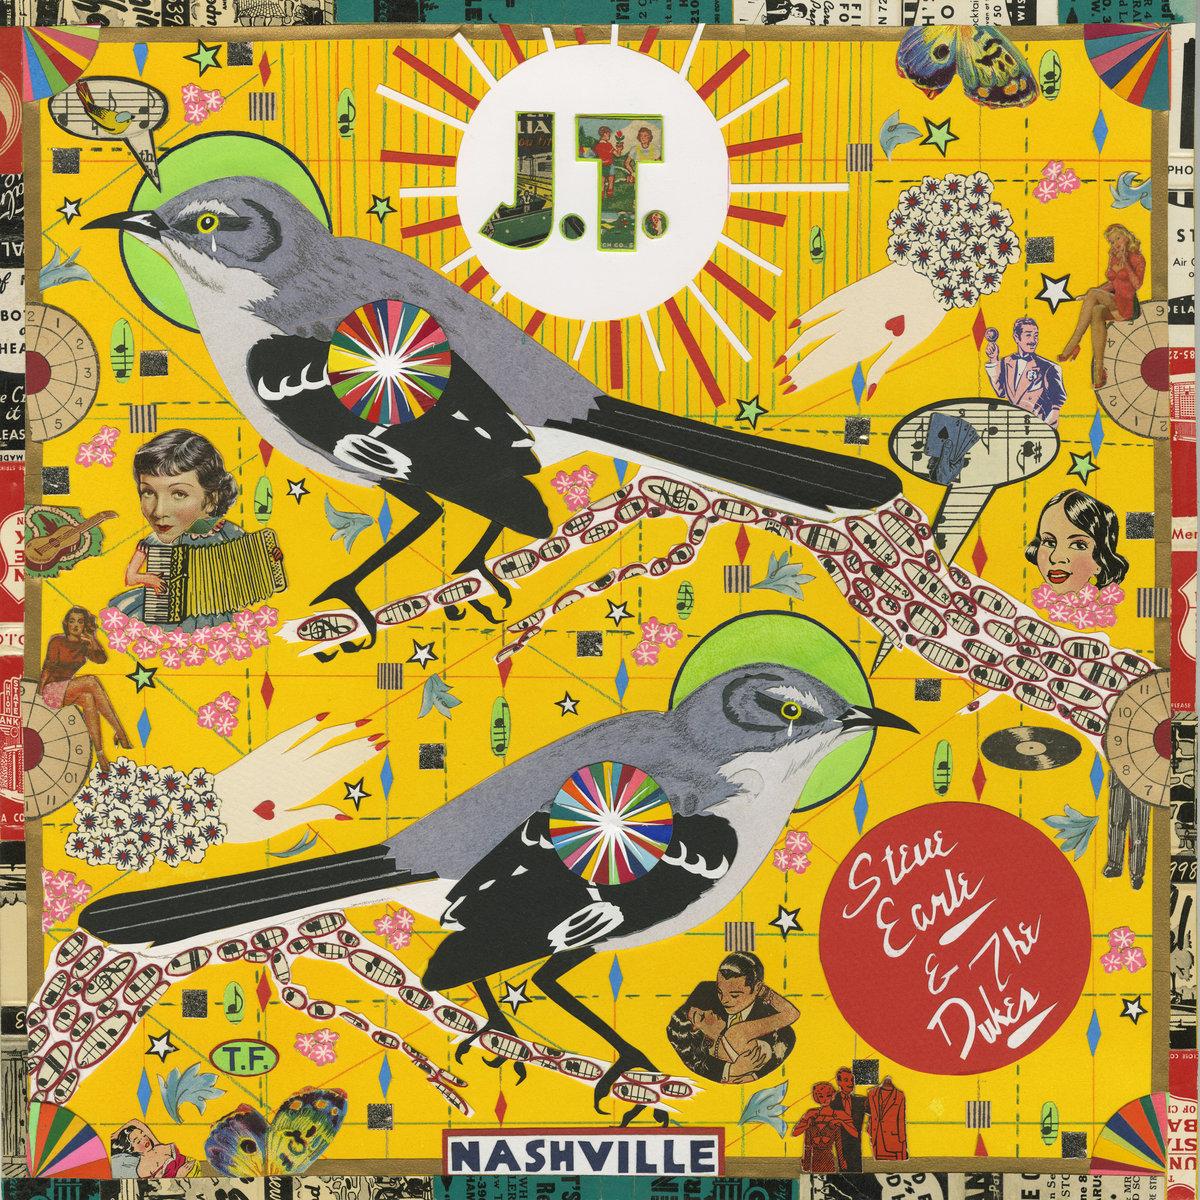 j t steve earle tribute stream Steve Earle Shares New Justin Townes Earle Covers Album J.T.: Stream